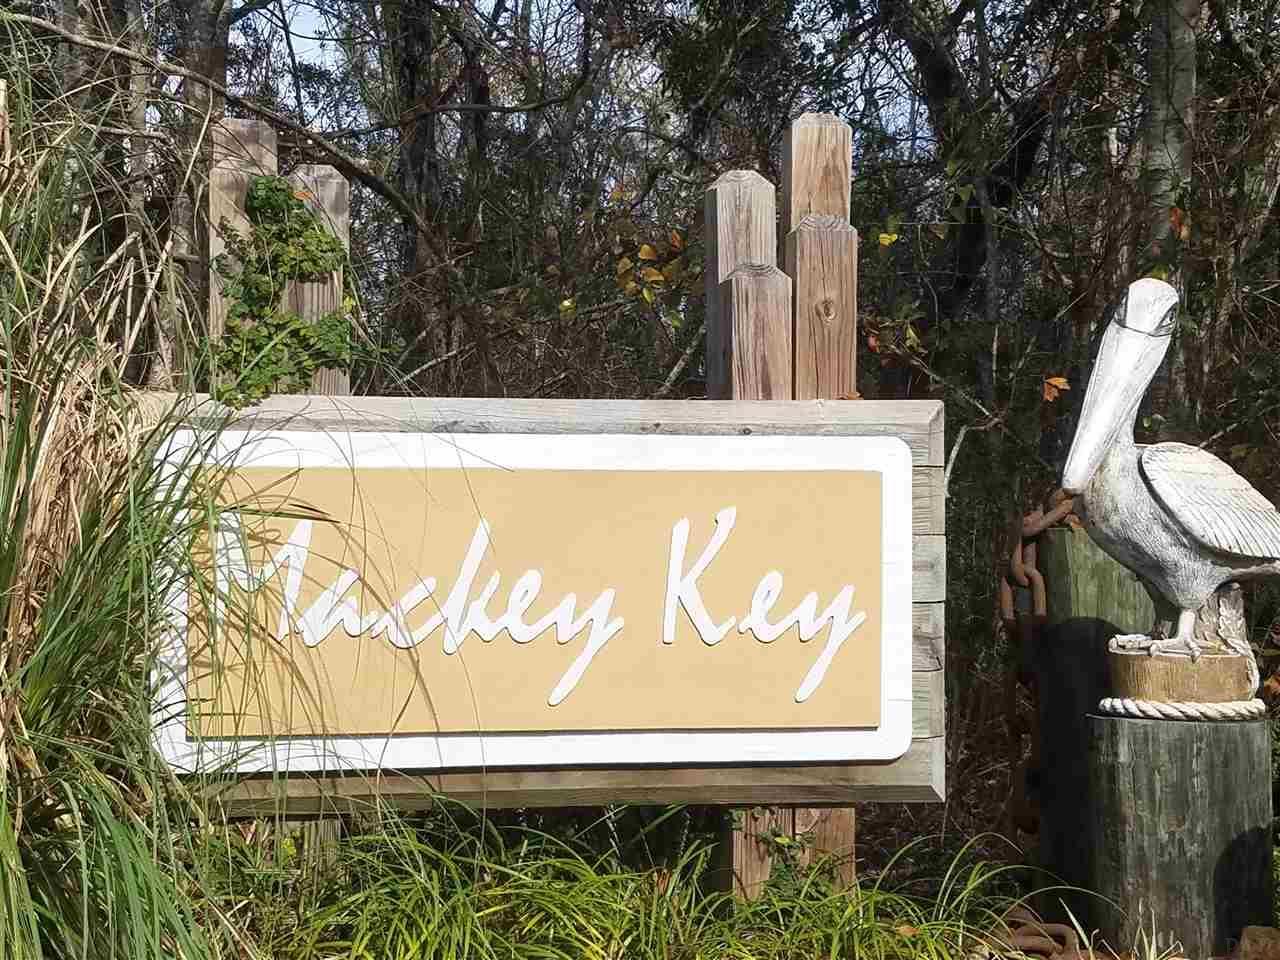 2003 Mackey Key Dr, Pensacola, FL 32514